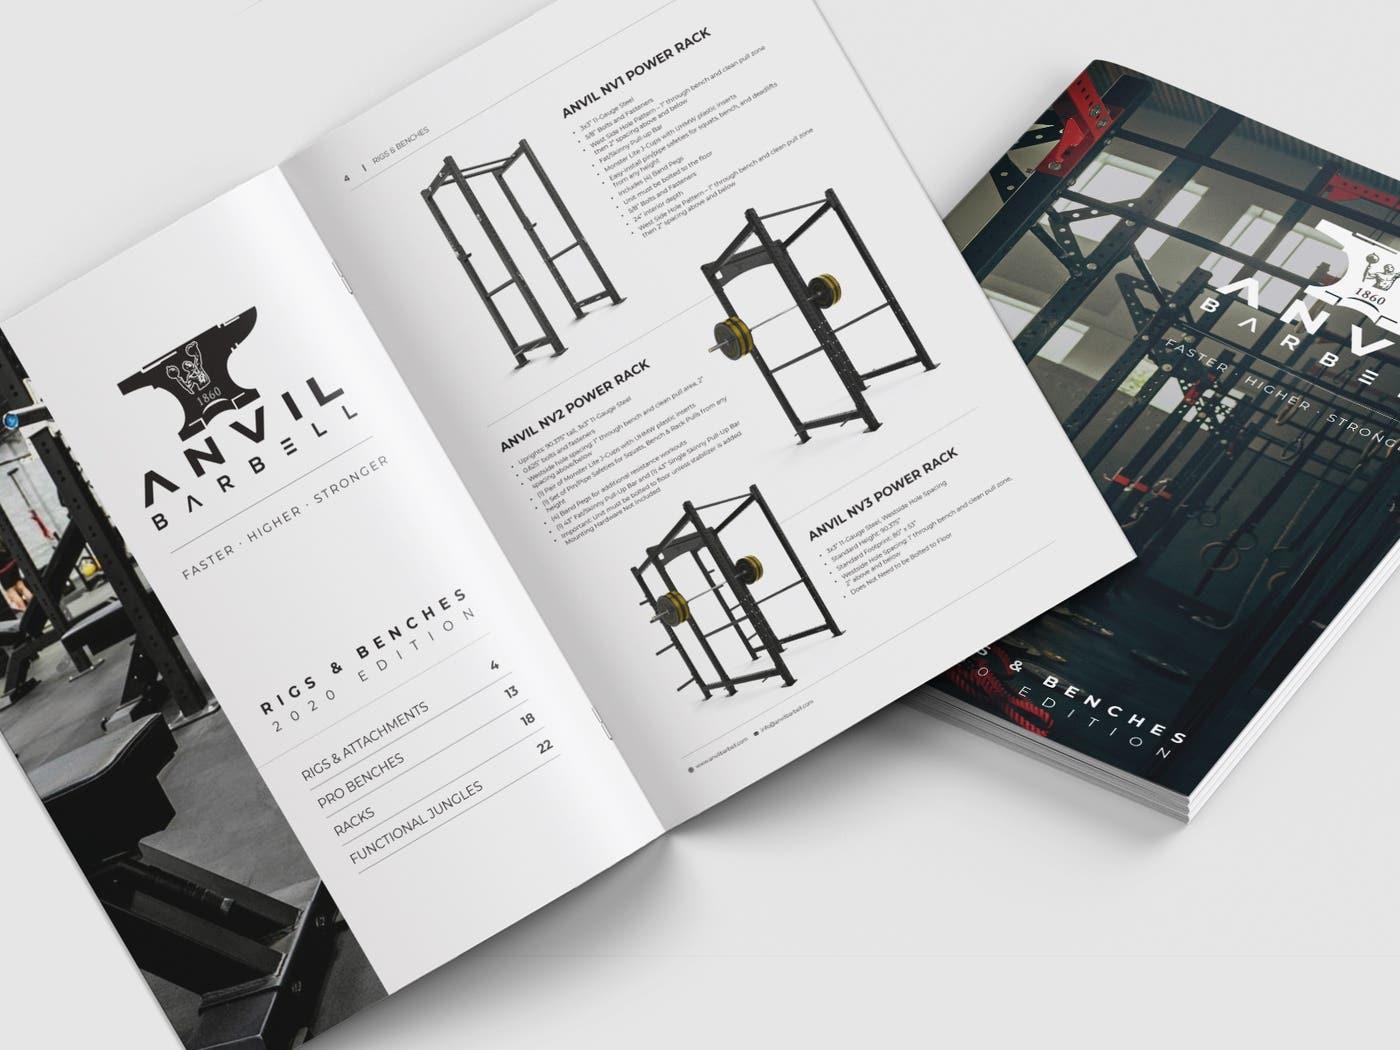 1786857-gym-catalogues-400-usd.jpg